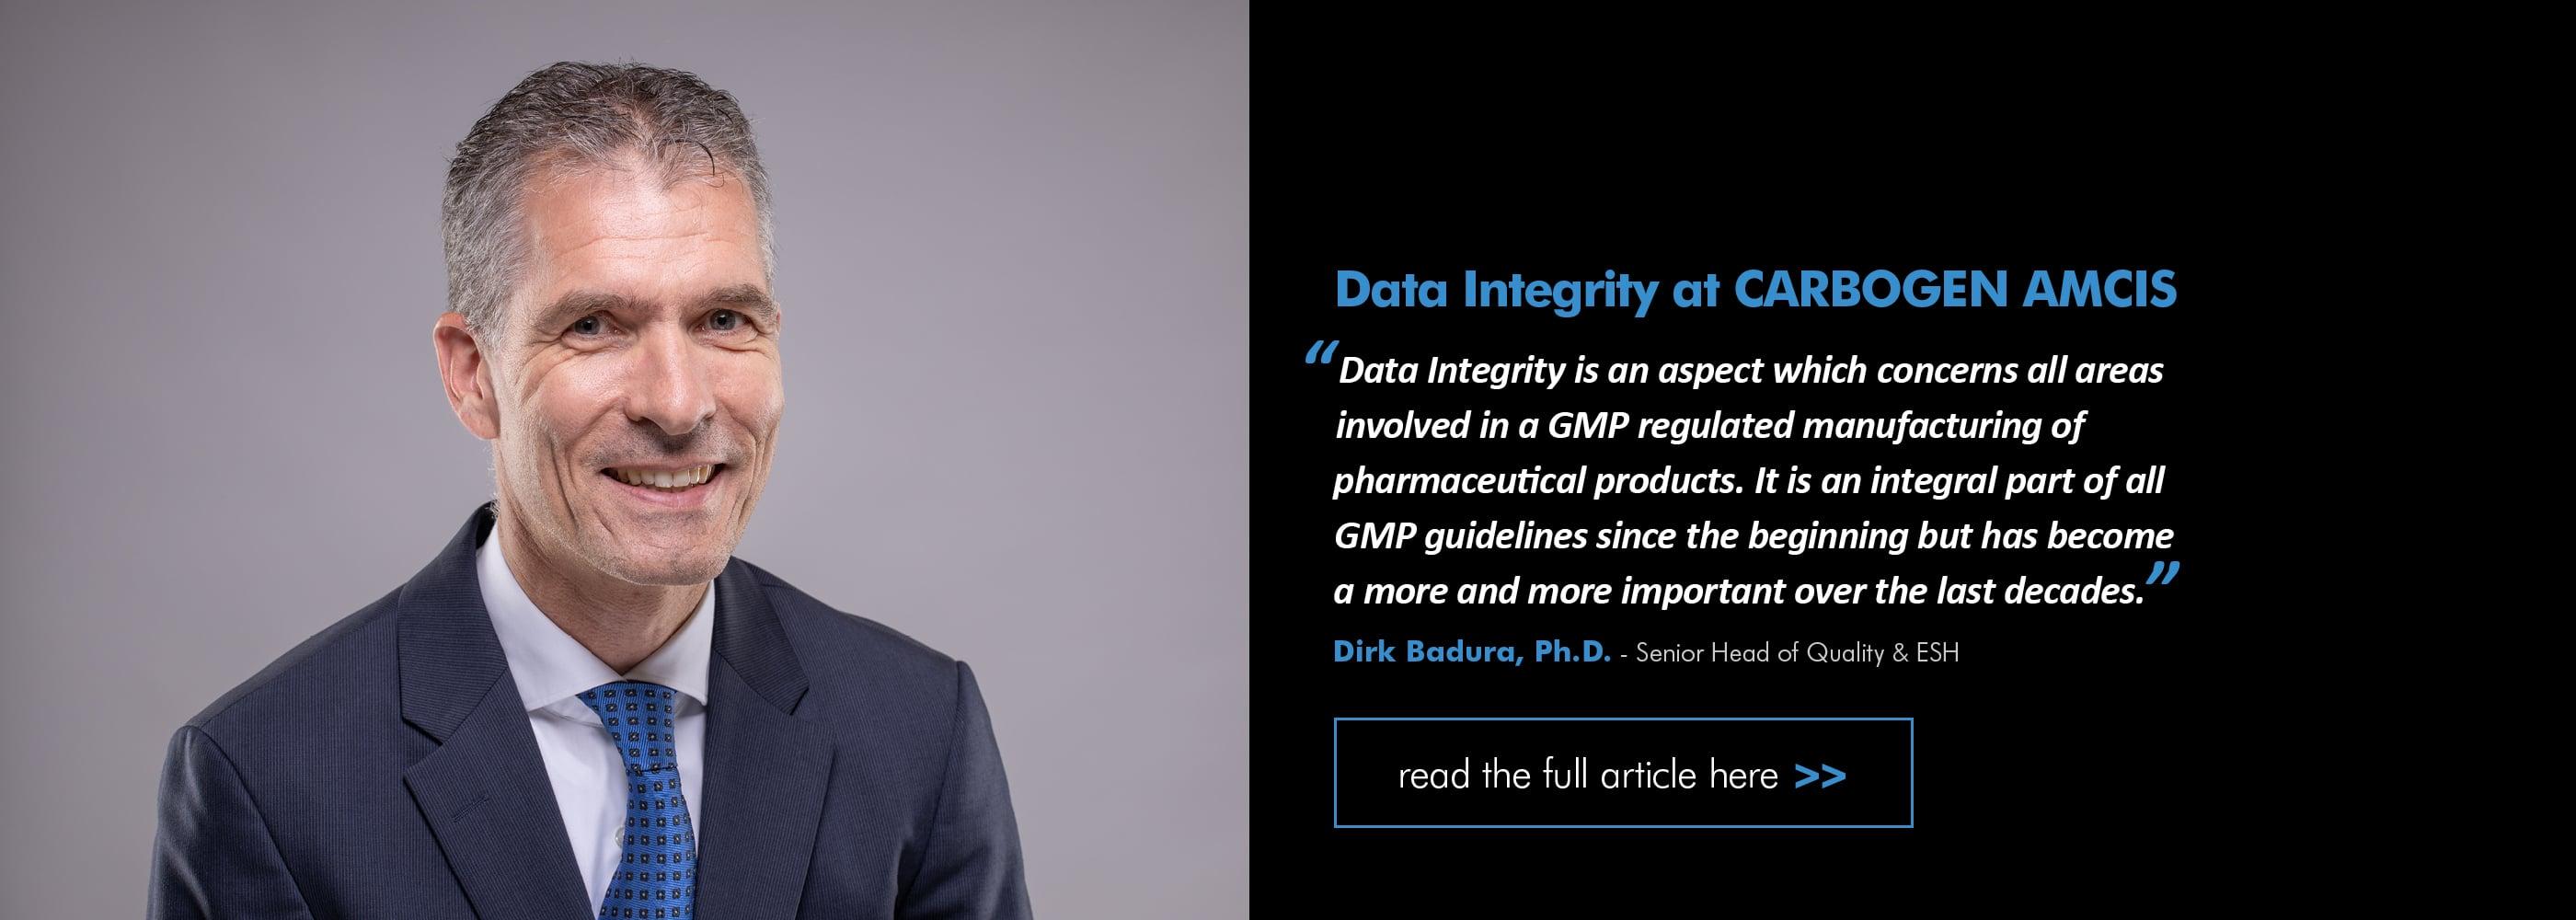 Data_Integrity_at_CARBOGEN_AMCIS